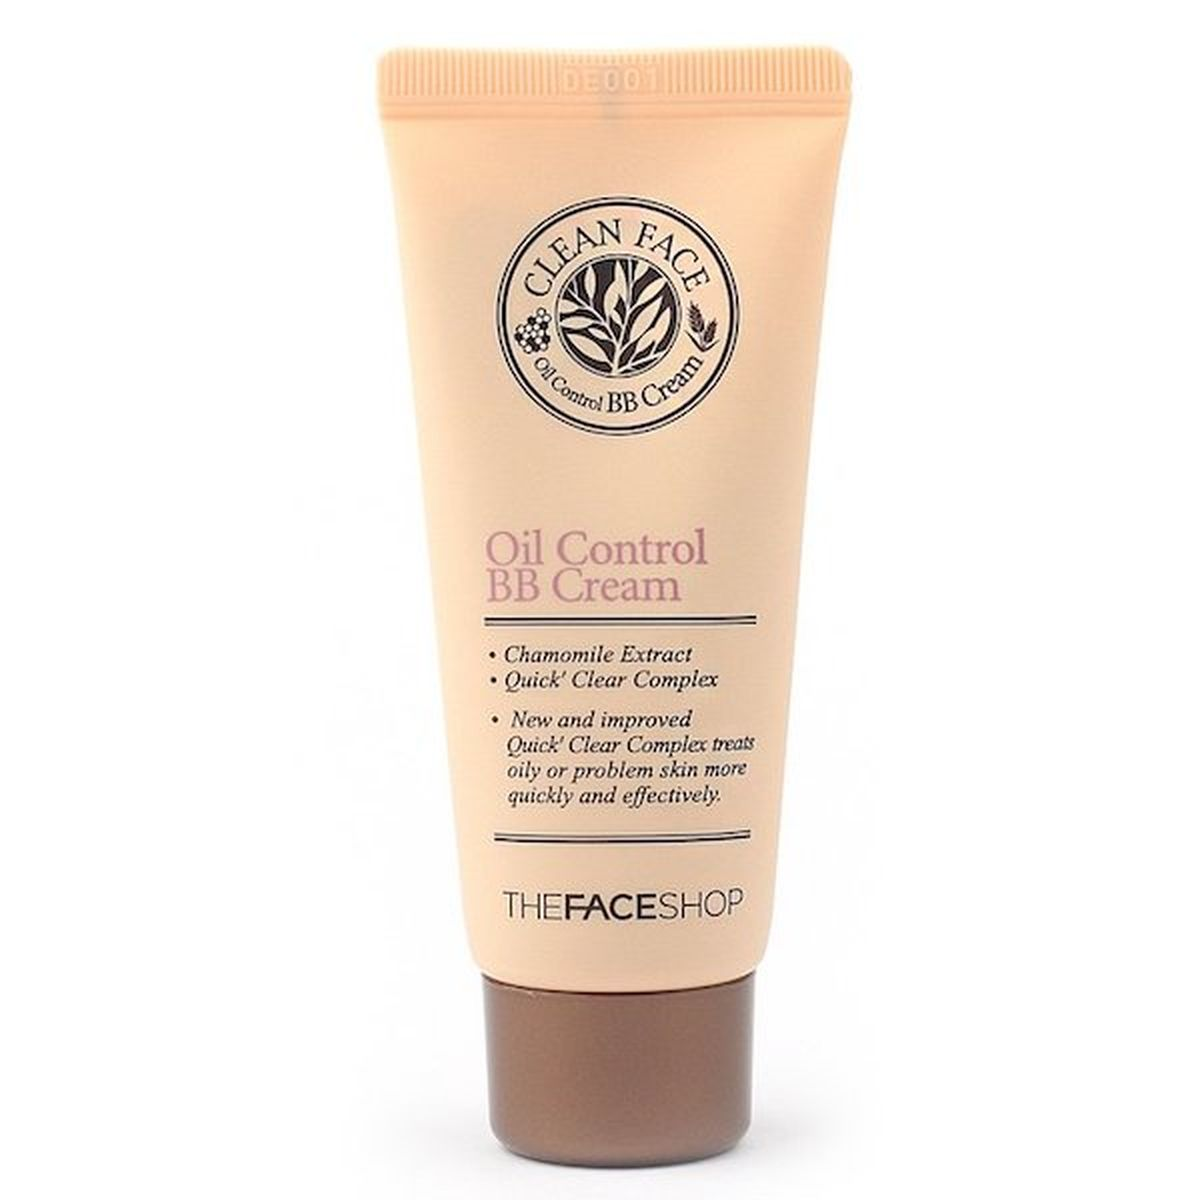 ББ крем для жирной кожи THE FACE SHOP Clean Face Oil Control BB Cream - 35 мл